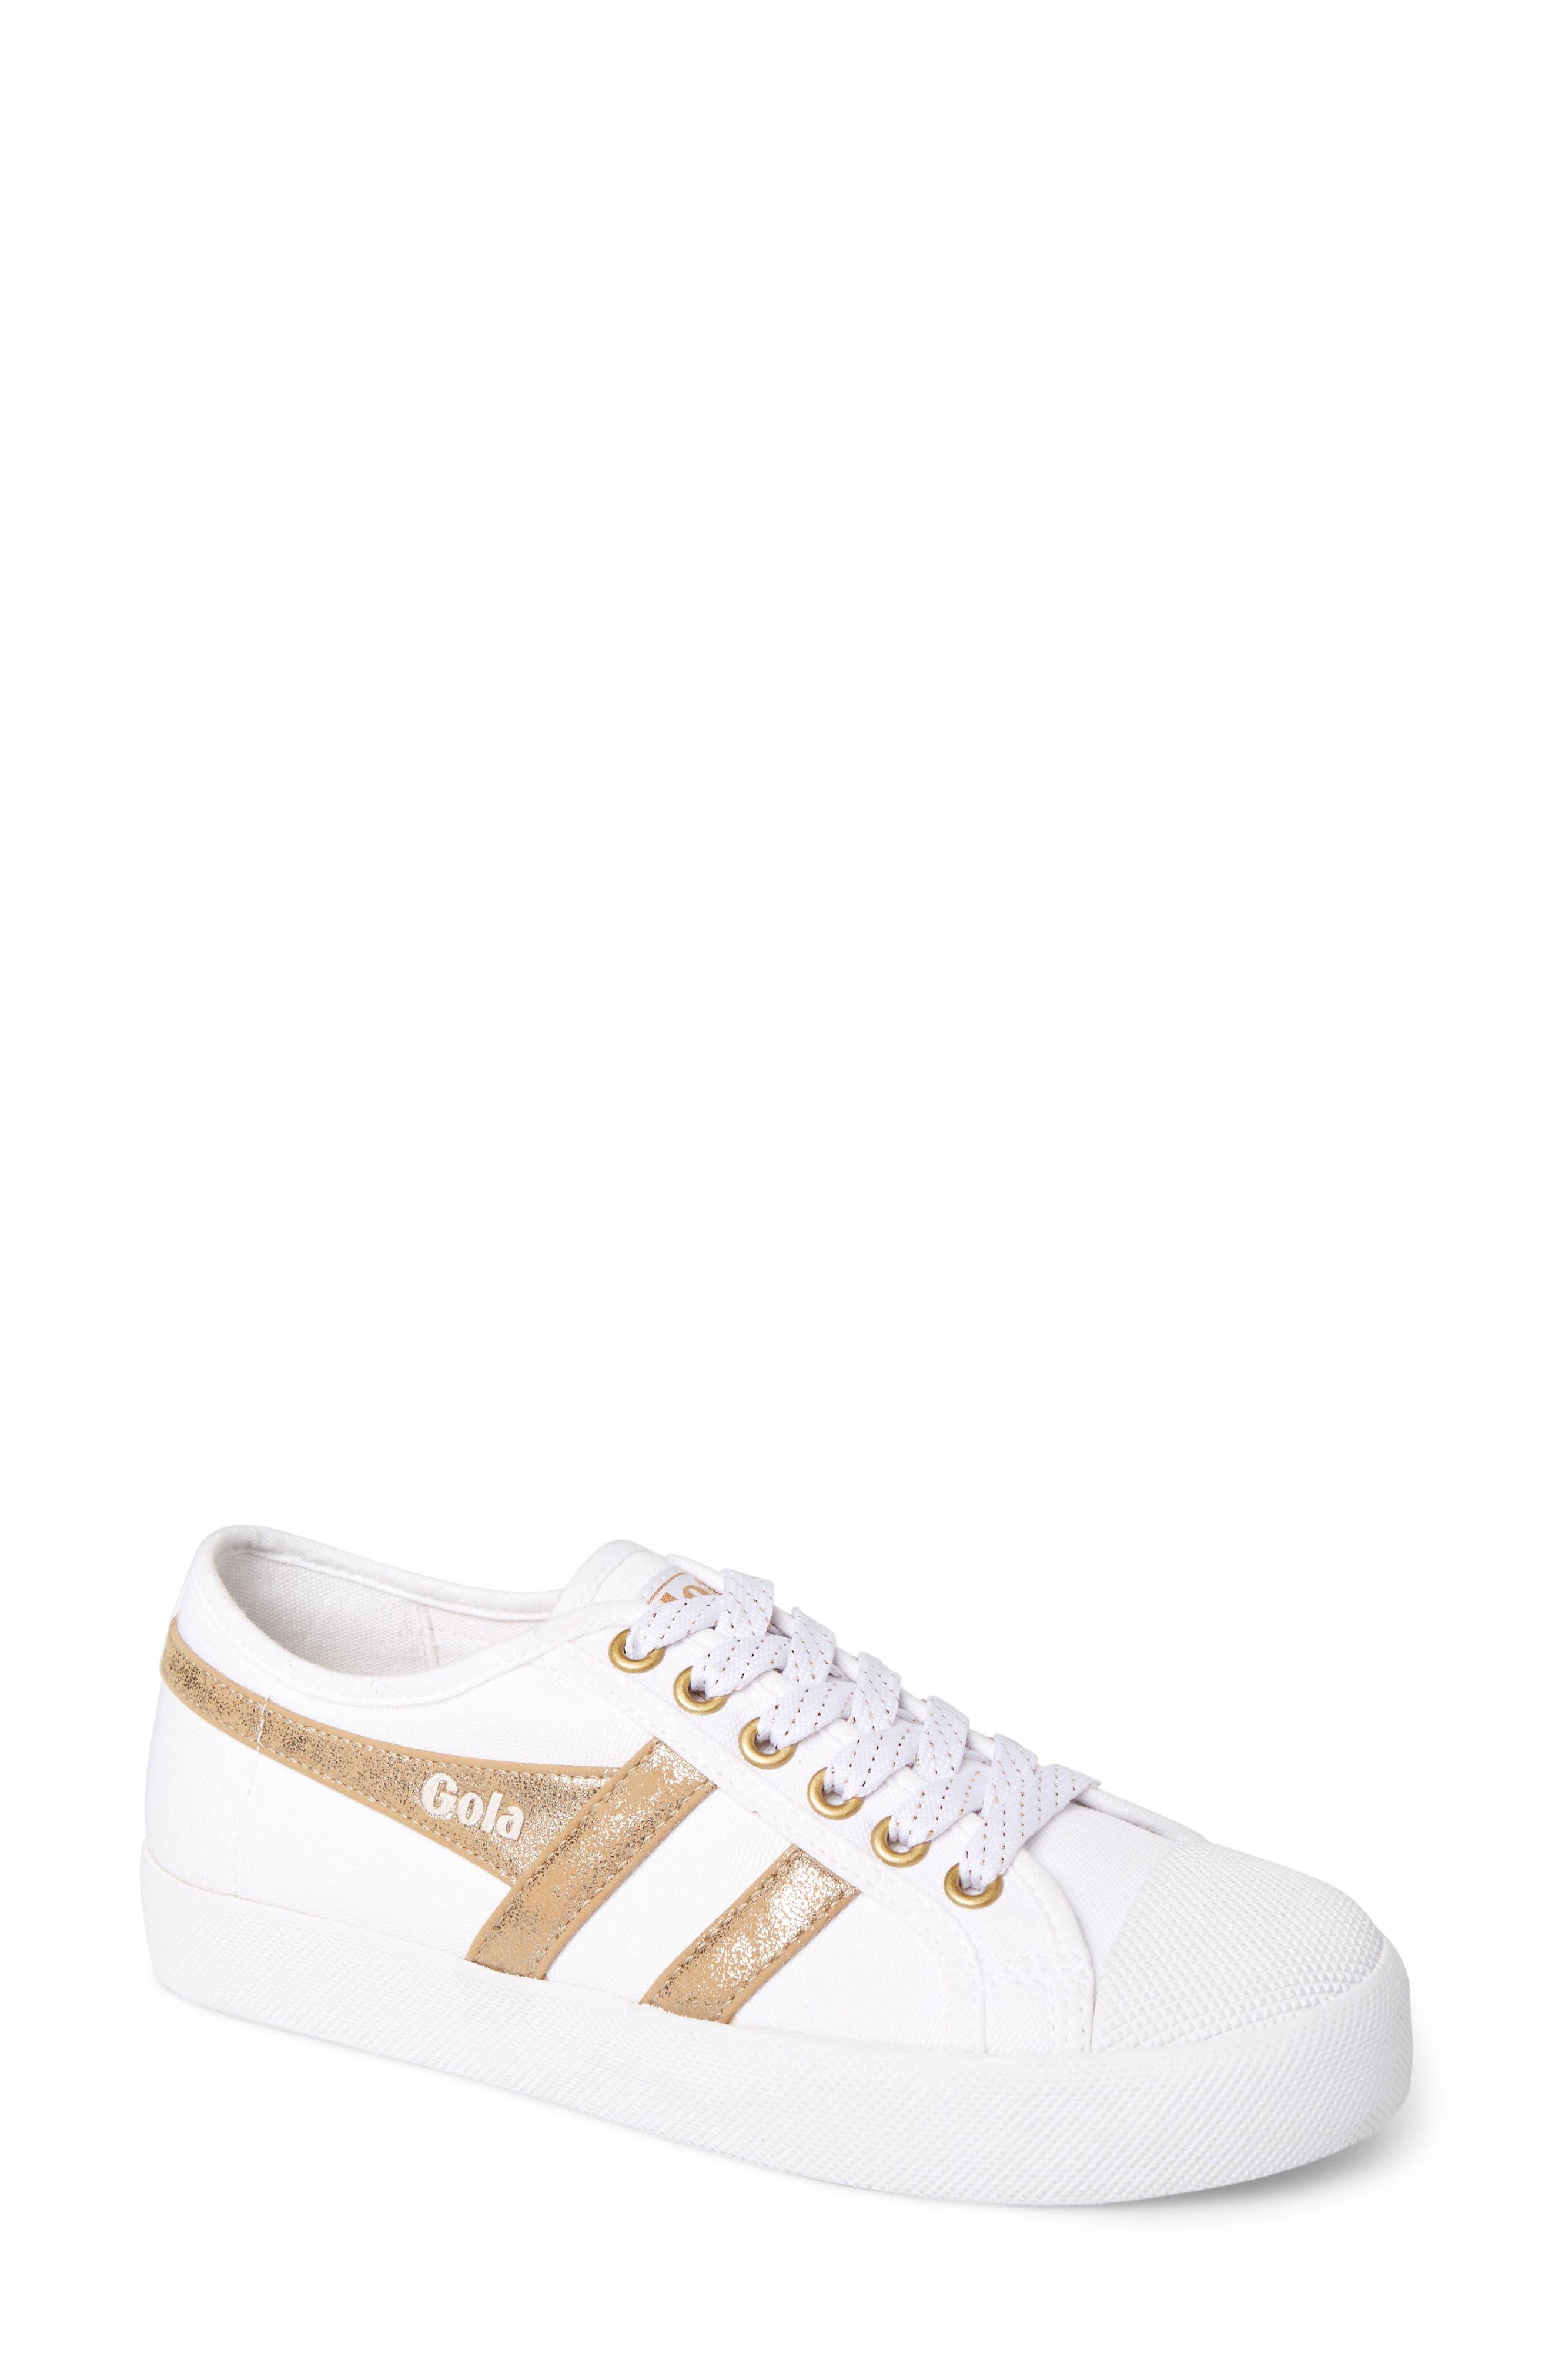 GOLA Coaster Mirror Sneaker, Main, color, WHITE/ GOLD